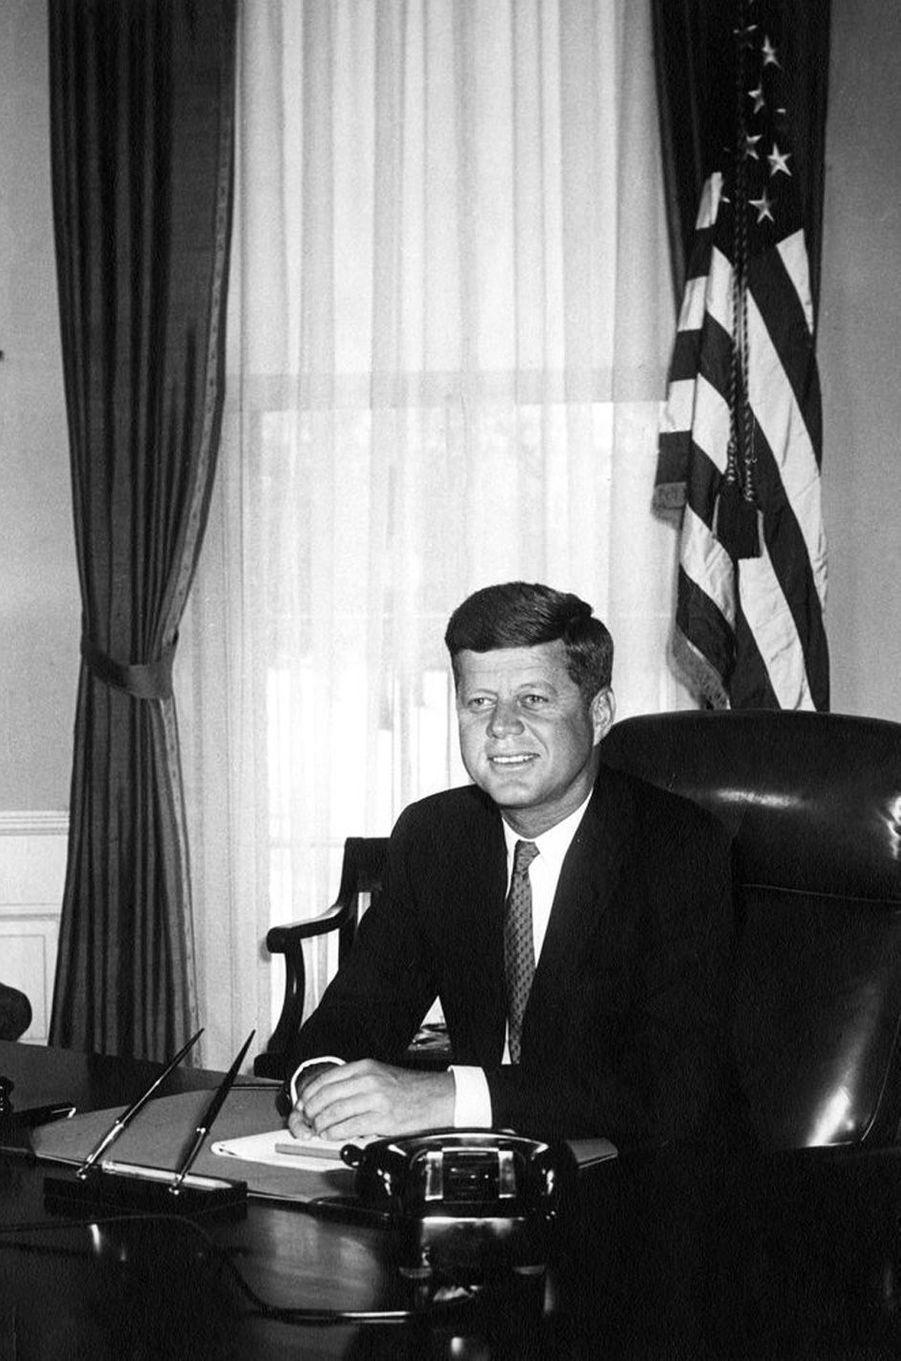 John F. Kennedy dans le Bureau ovale, le 21 janvier 1961.